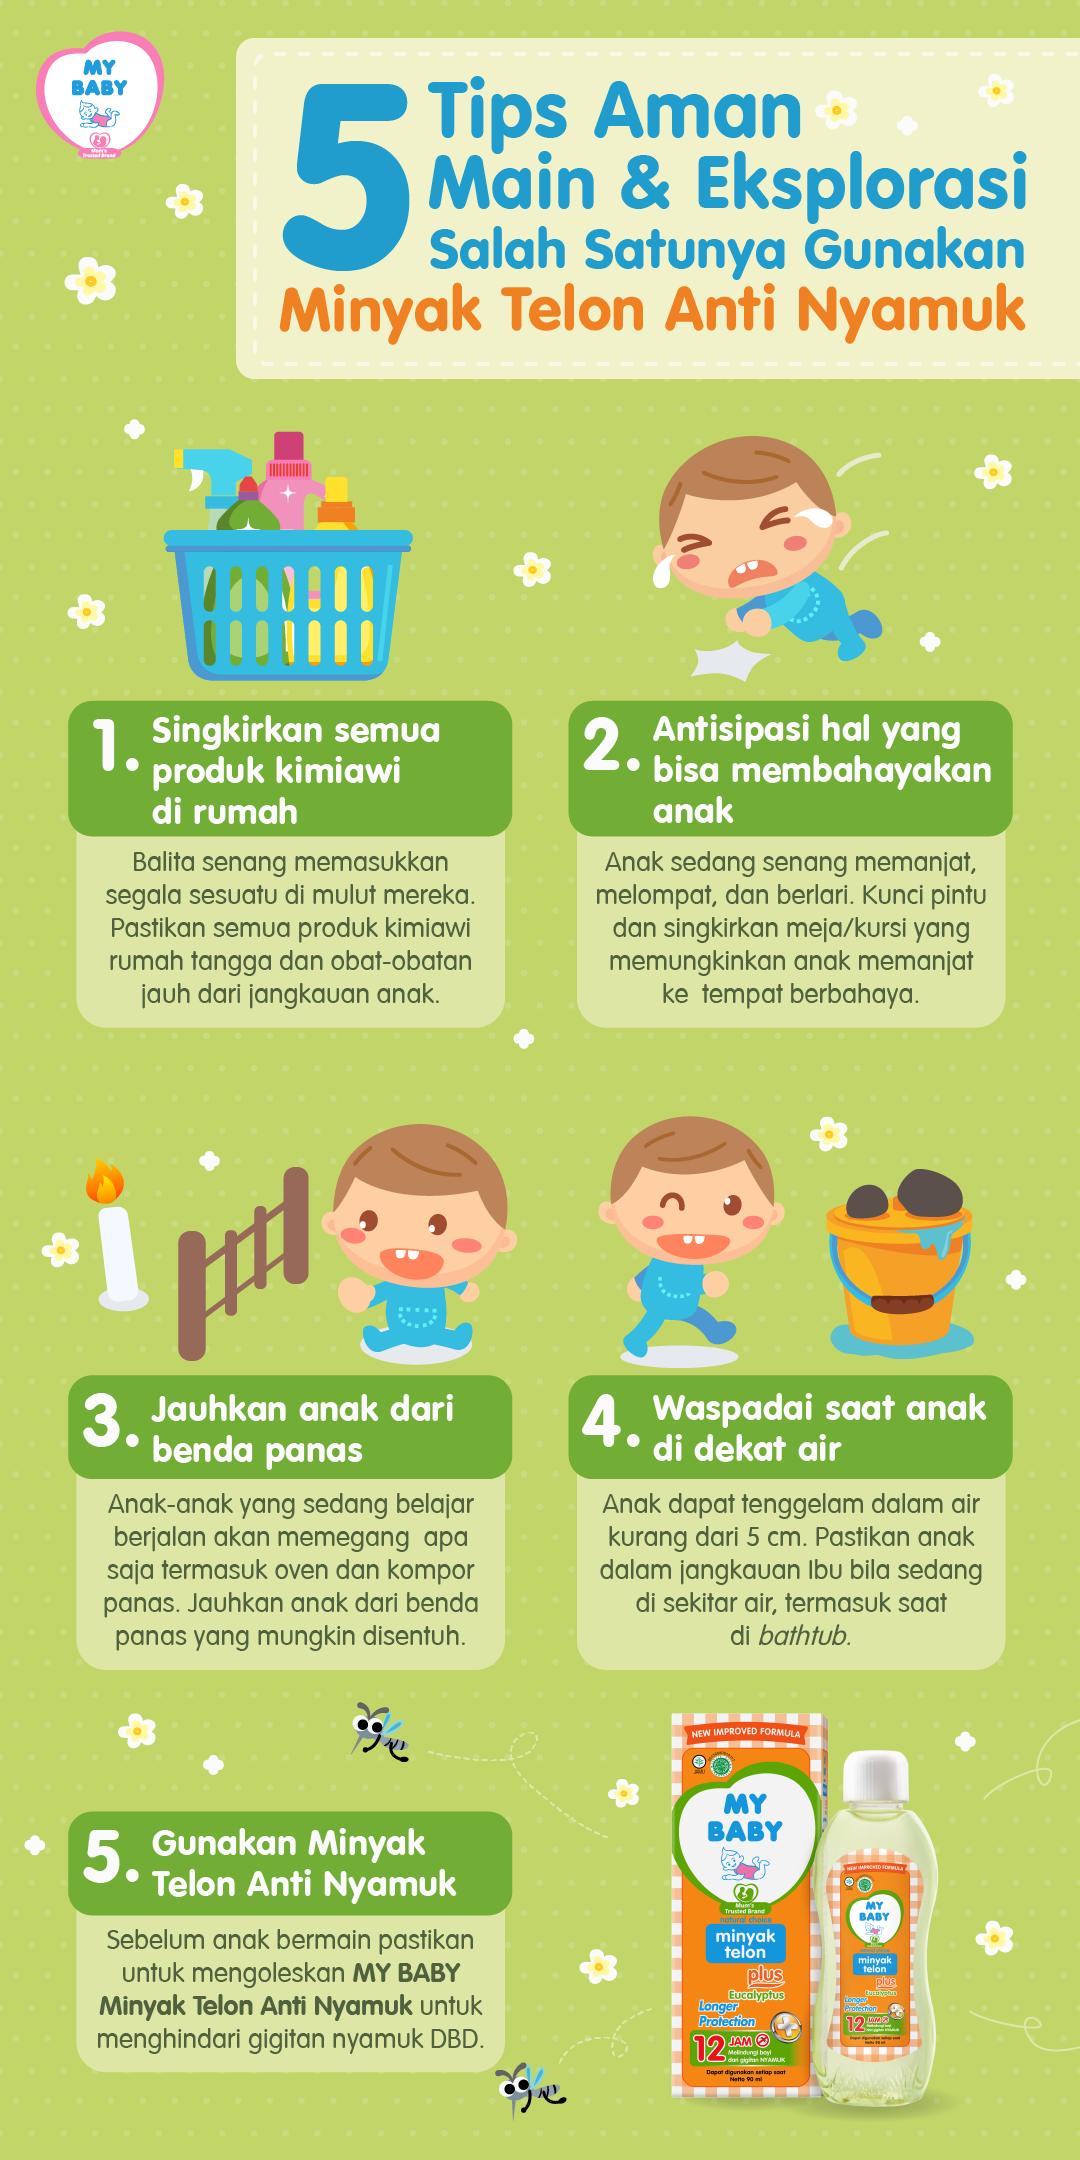 5 Tips Aman Main & Eksplorasi, Salah Satunya Gunakan Minyak Telon Anti Nyamuk